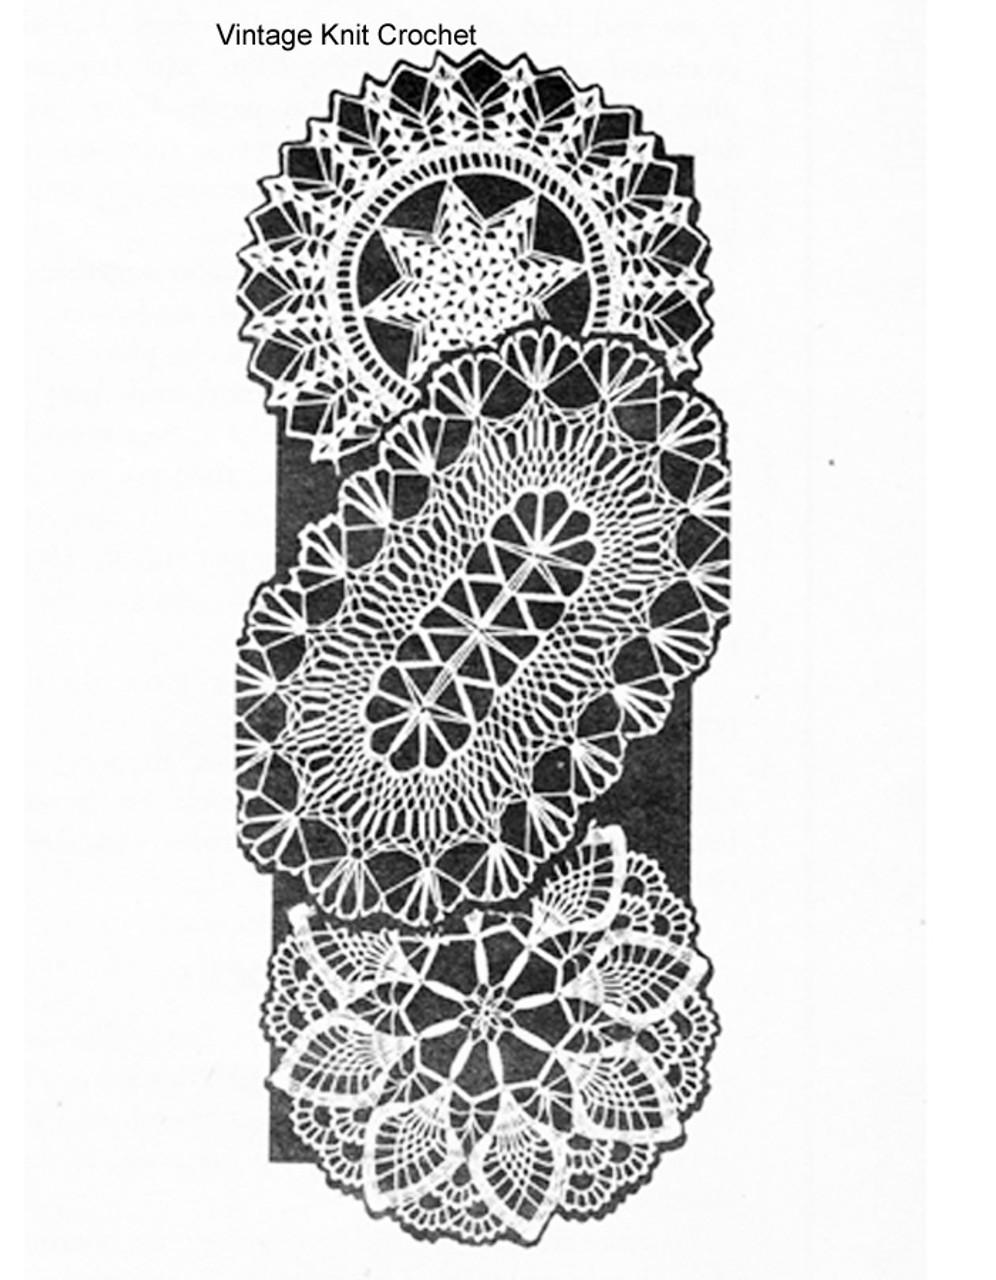 Round Oval Doilies Crochet Pattern, Laura Wheeler 882